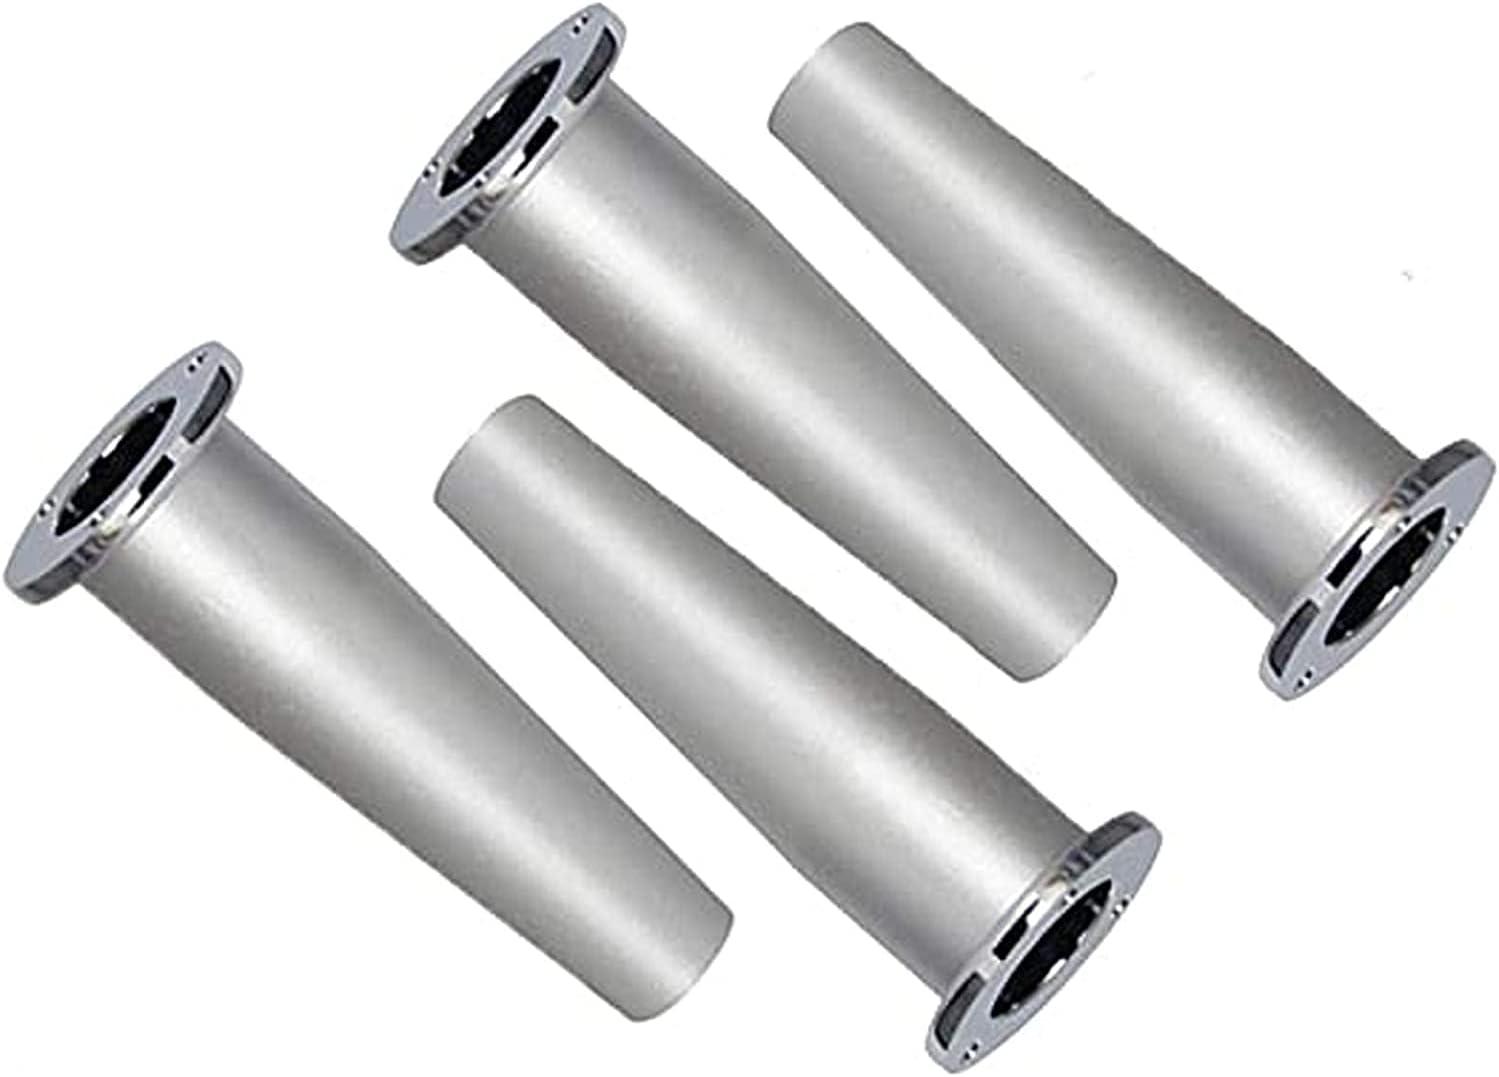 BINHC Over item handling Niture Legs Aluminum Sofa Adjustable Tab Award